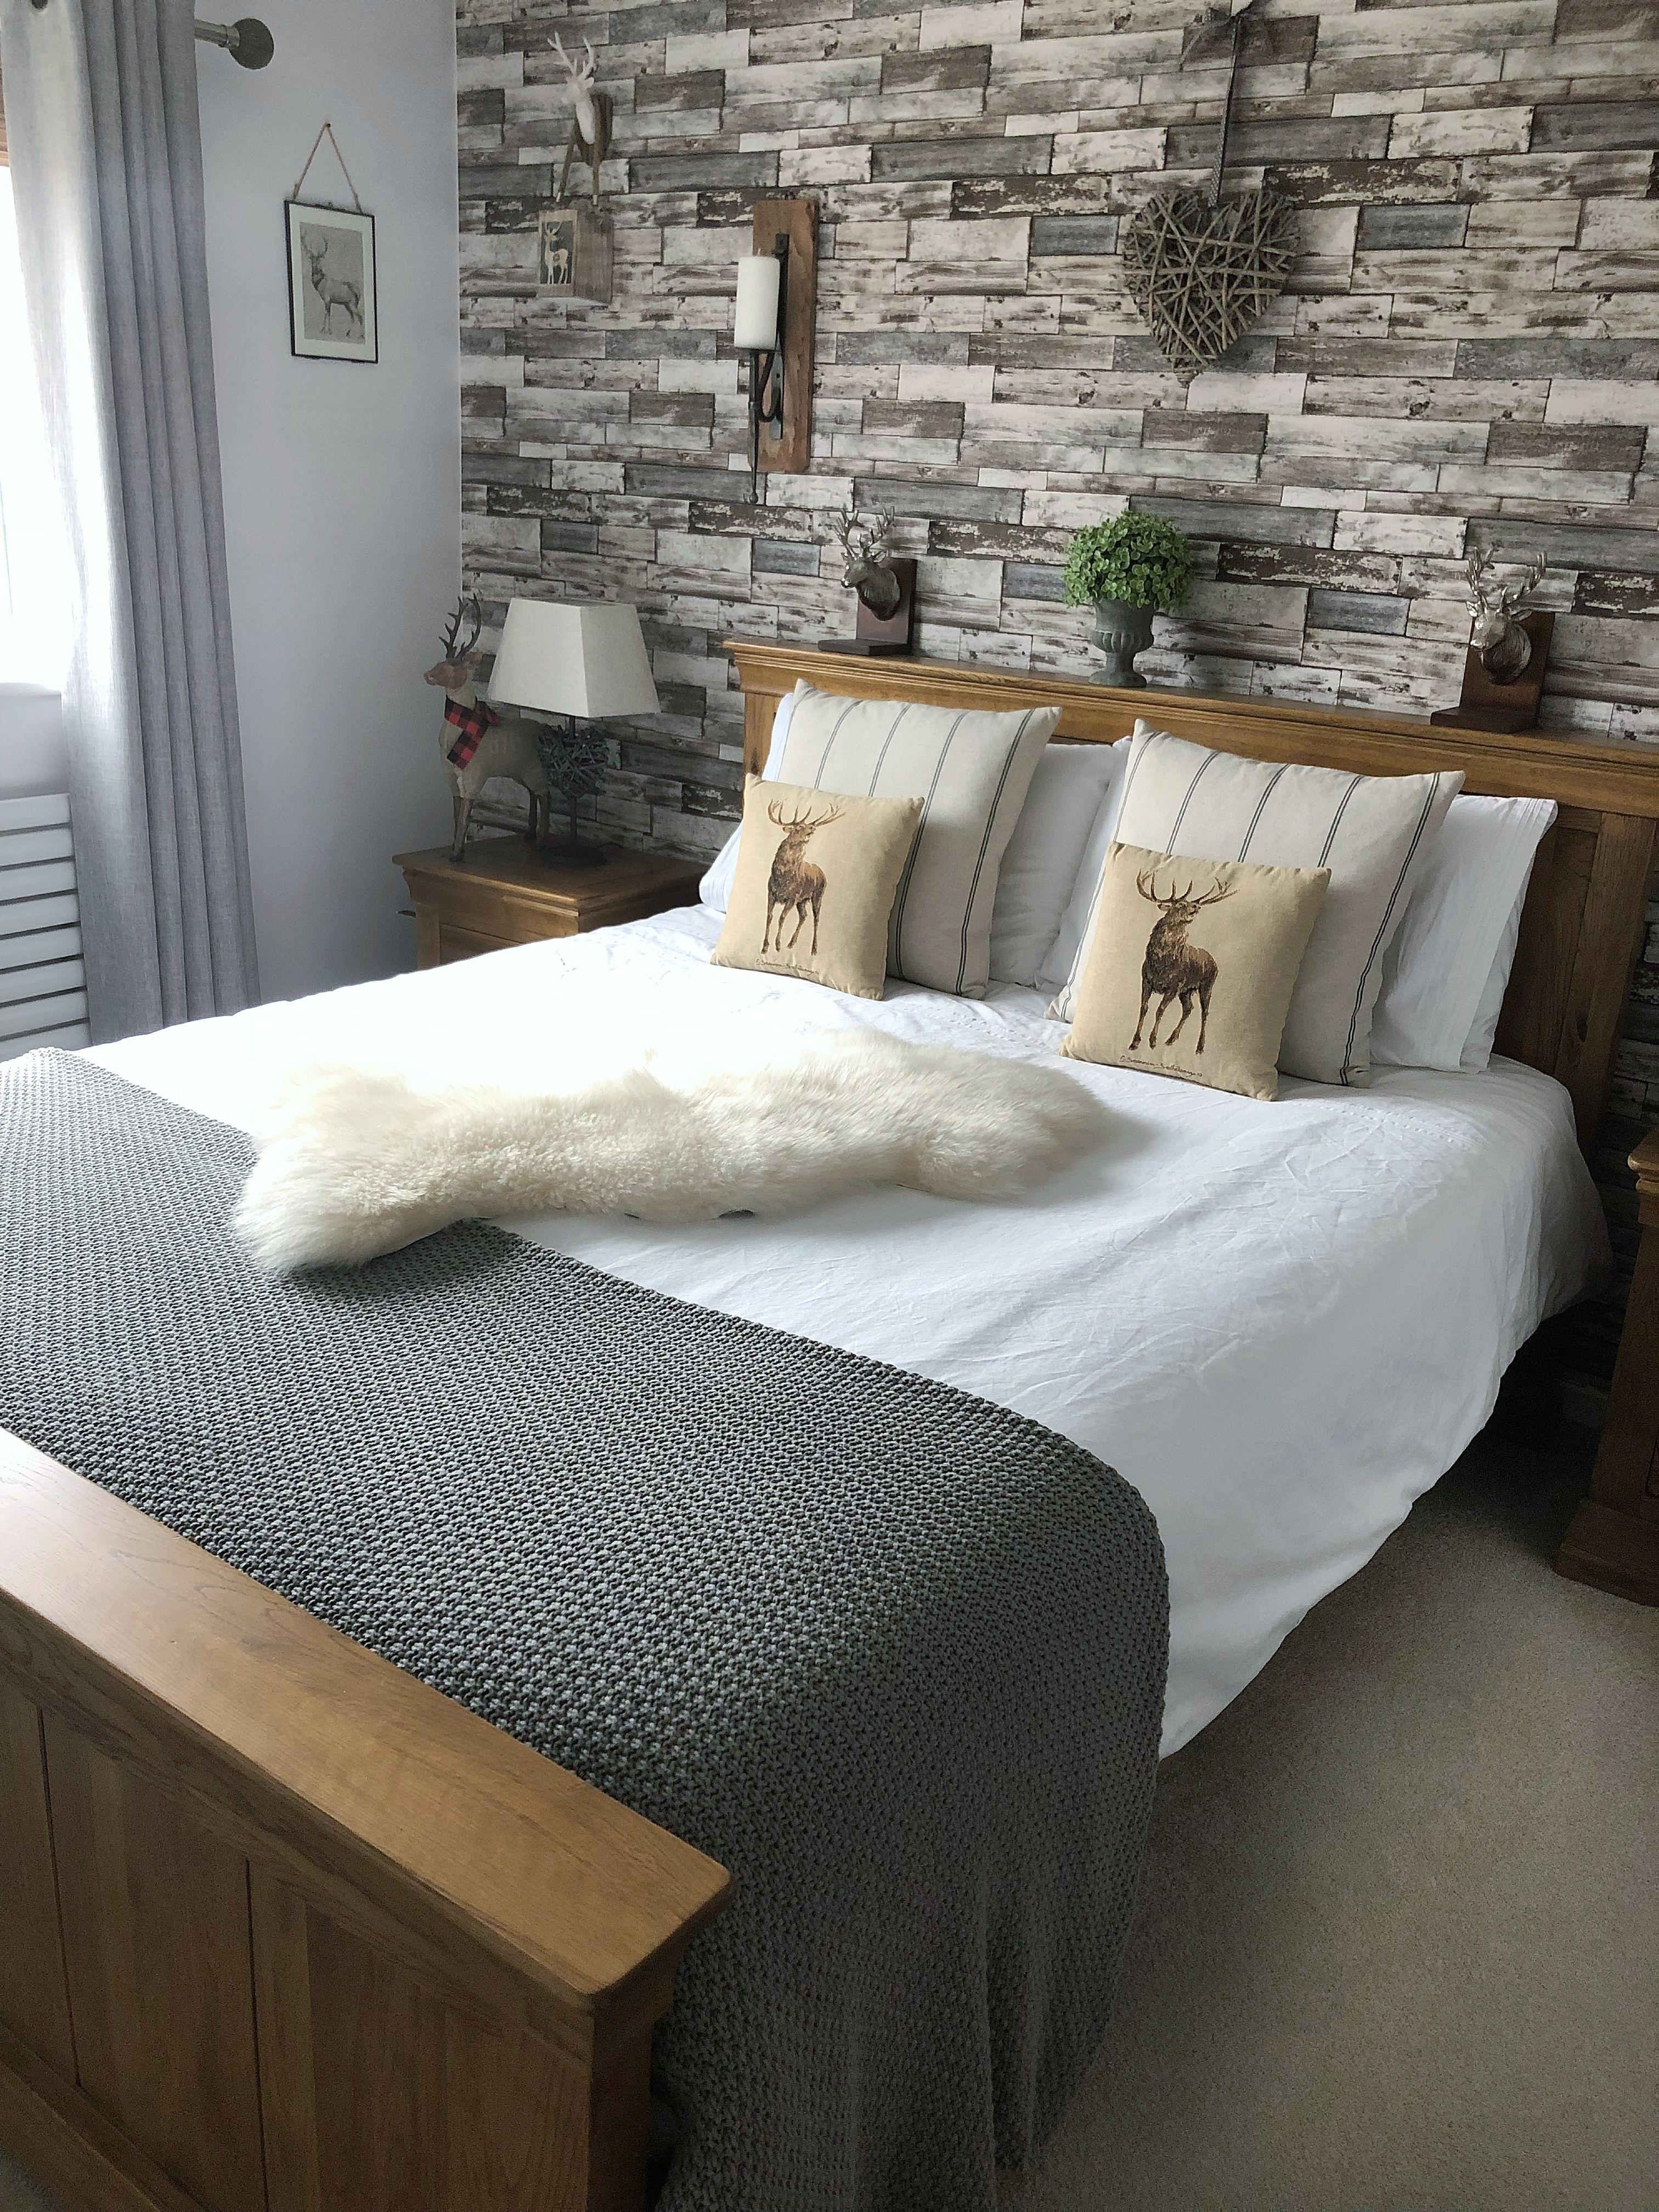 My Farmhouse Inspired Bedroom